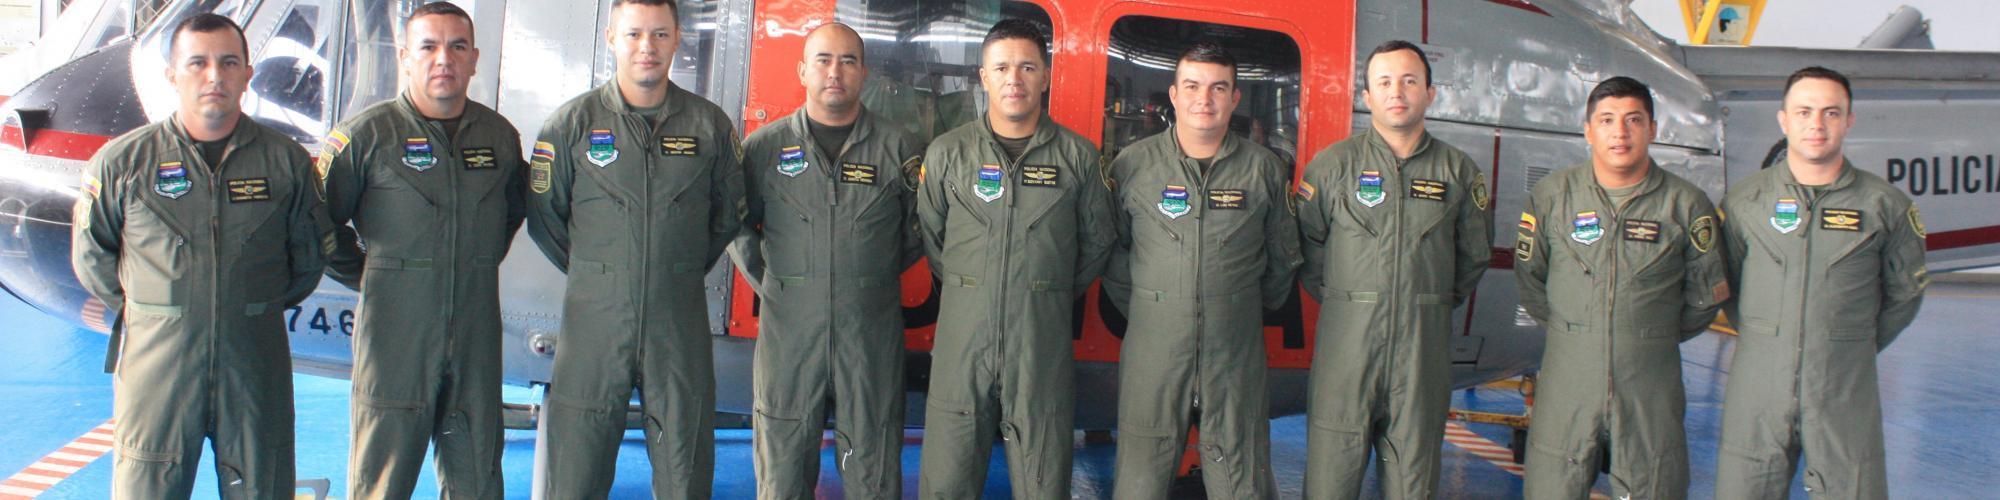 Escuela de Aviación Policial - ESAVI